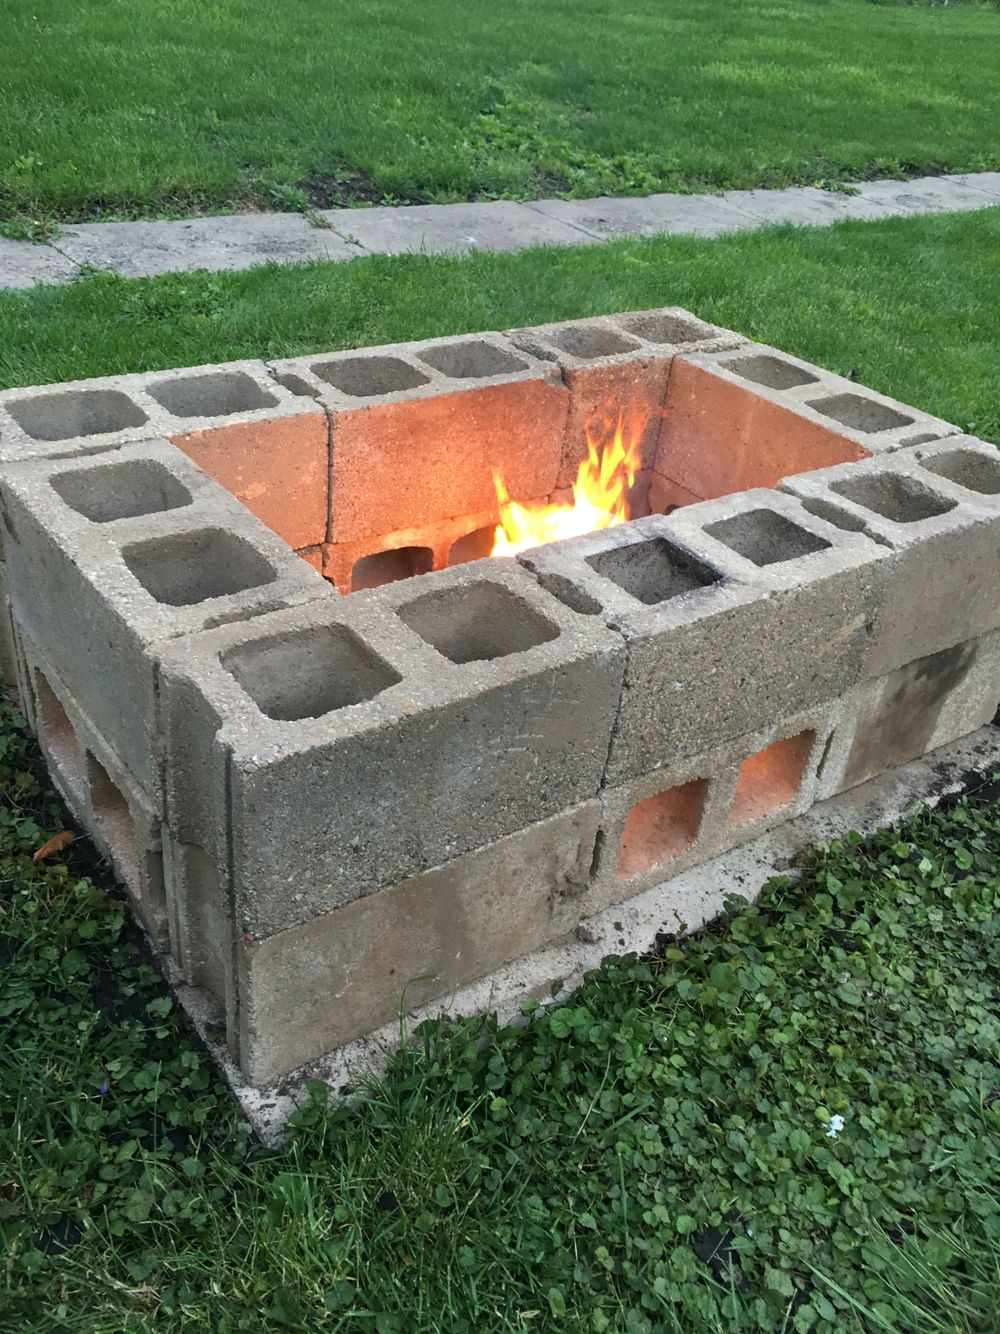 Diy Square Cinder Block Fire Pit Cinder Block Fire Pit Fire Pit